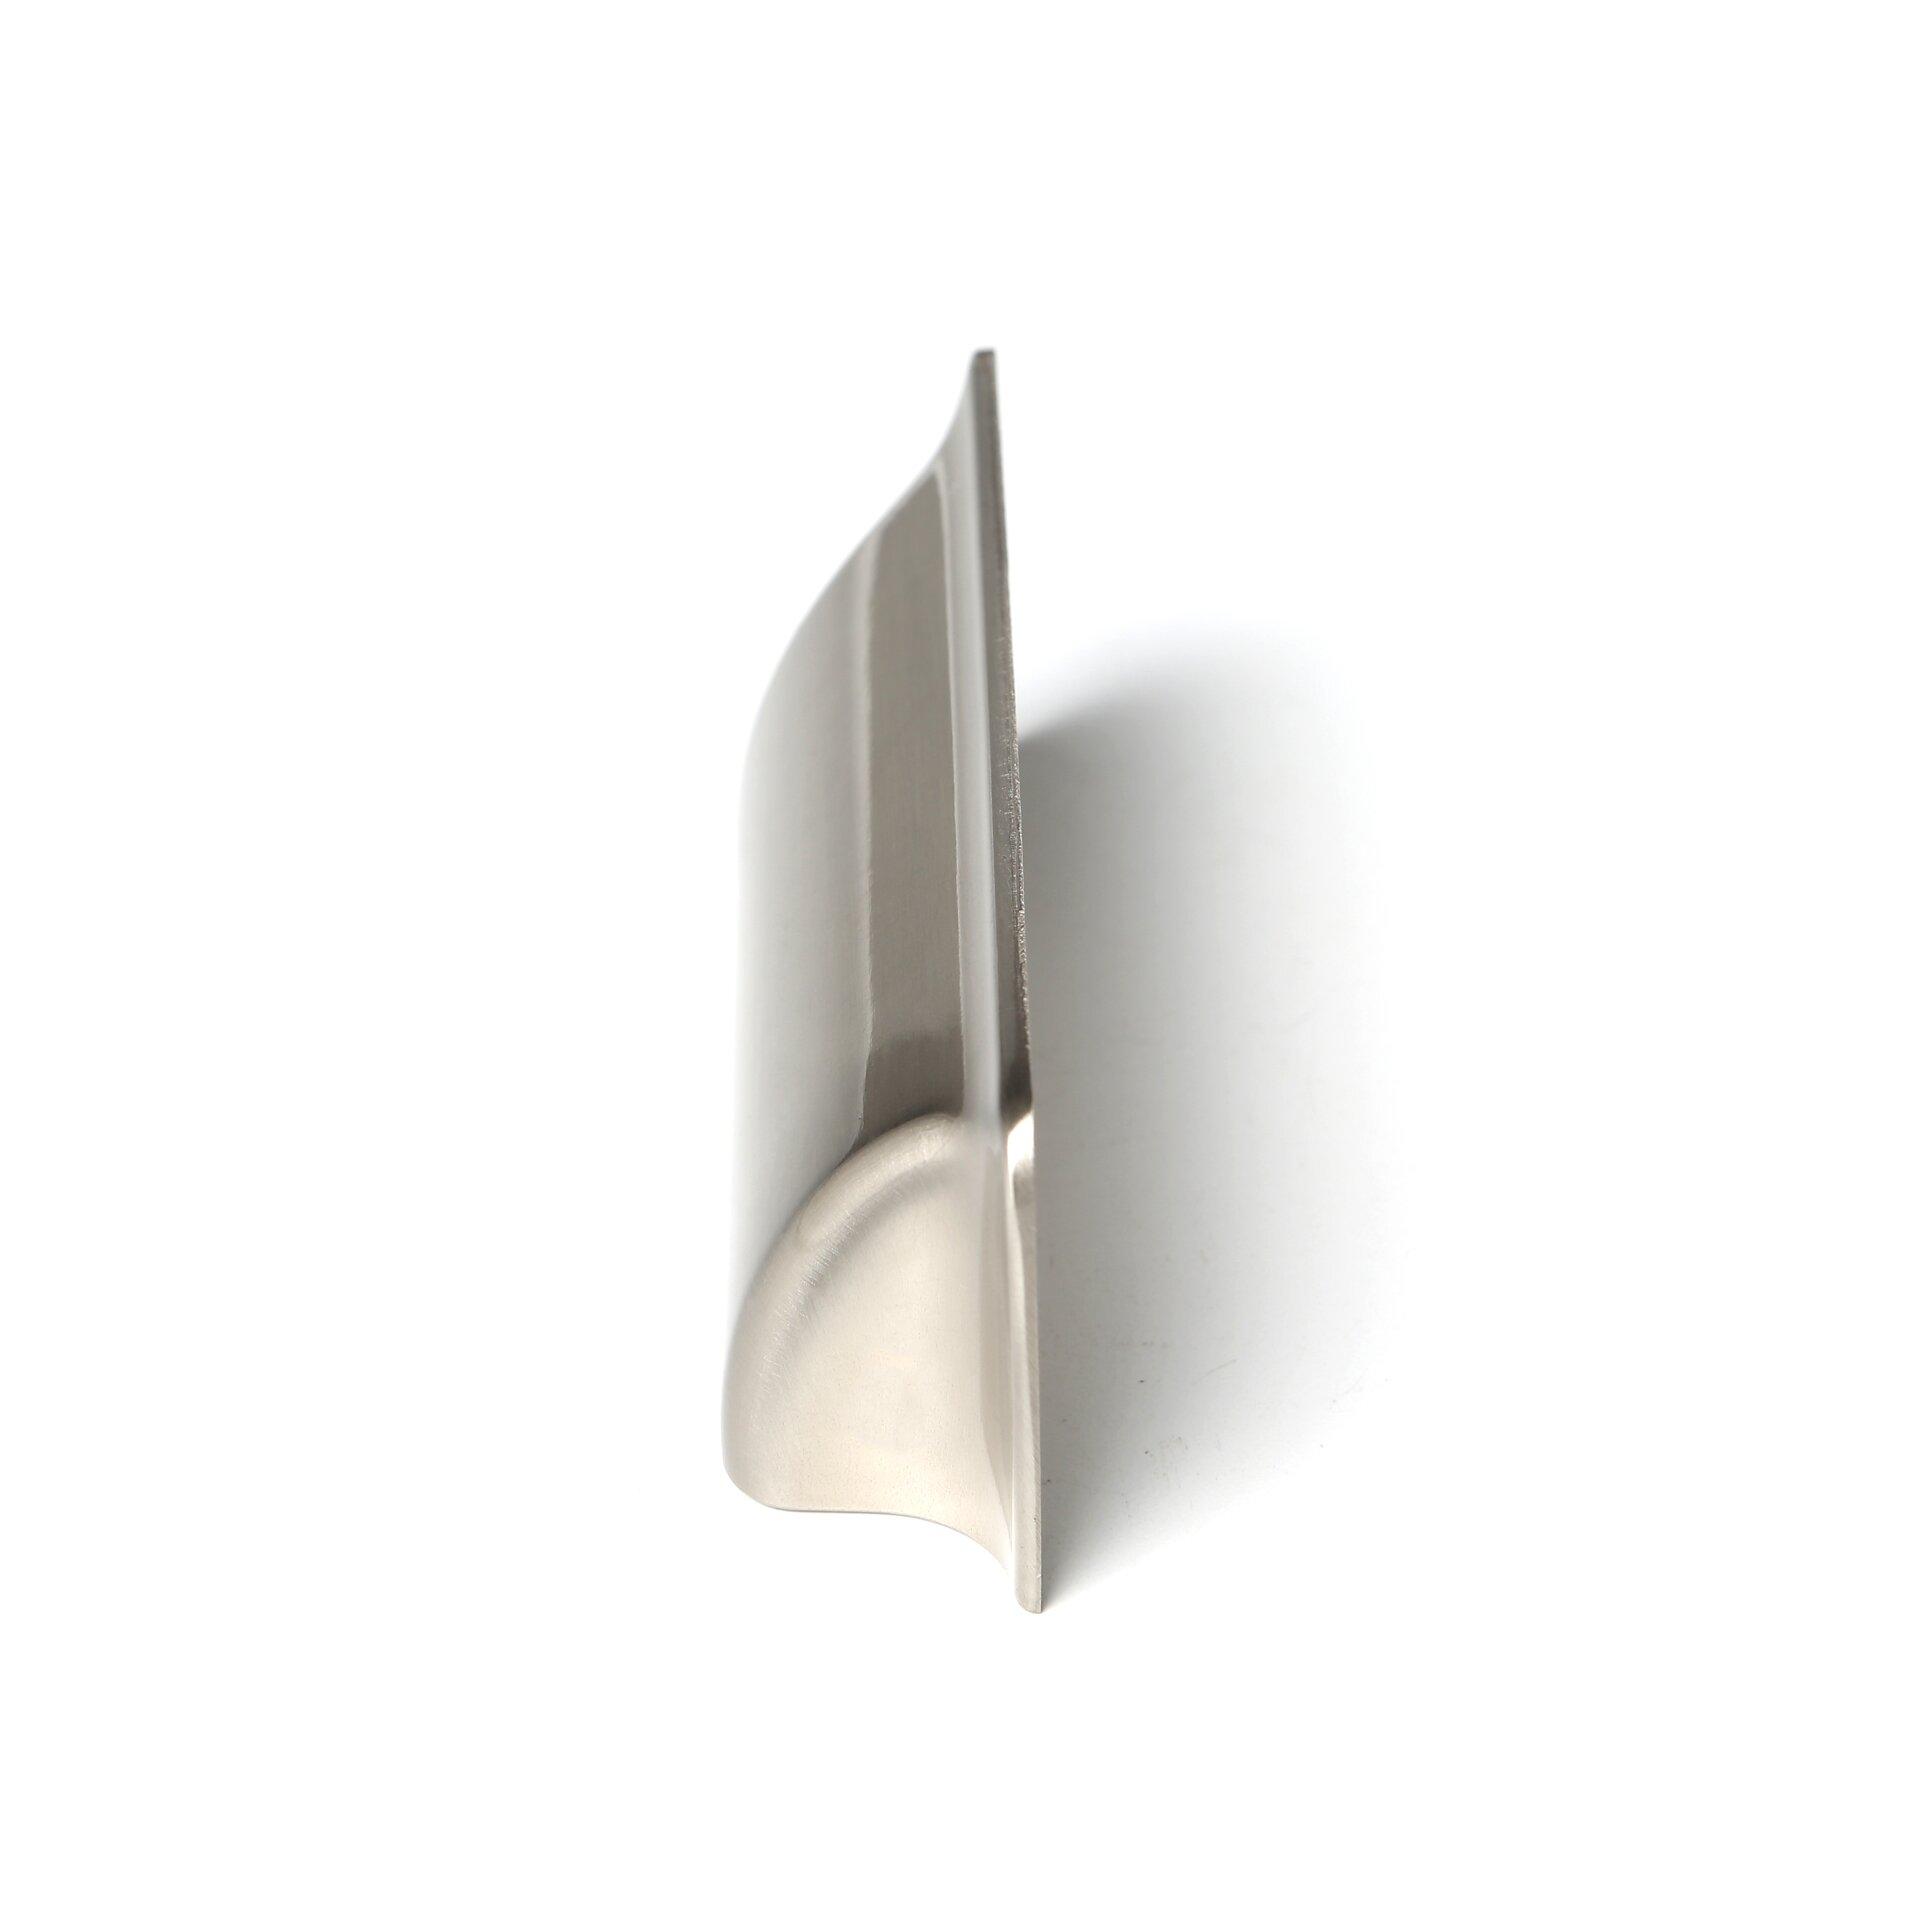 Decorative Bin Pulls : Liberty hardware decorative quot bin pull reviews wayfair